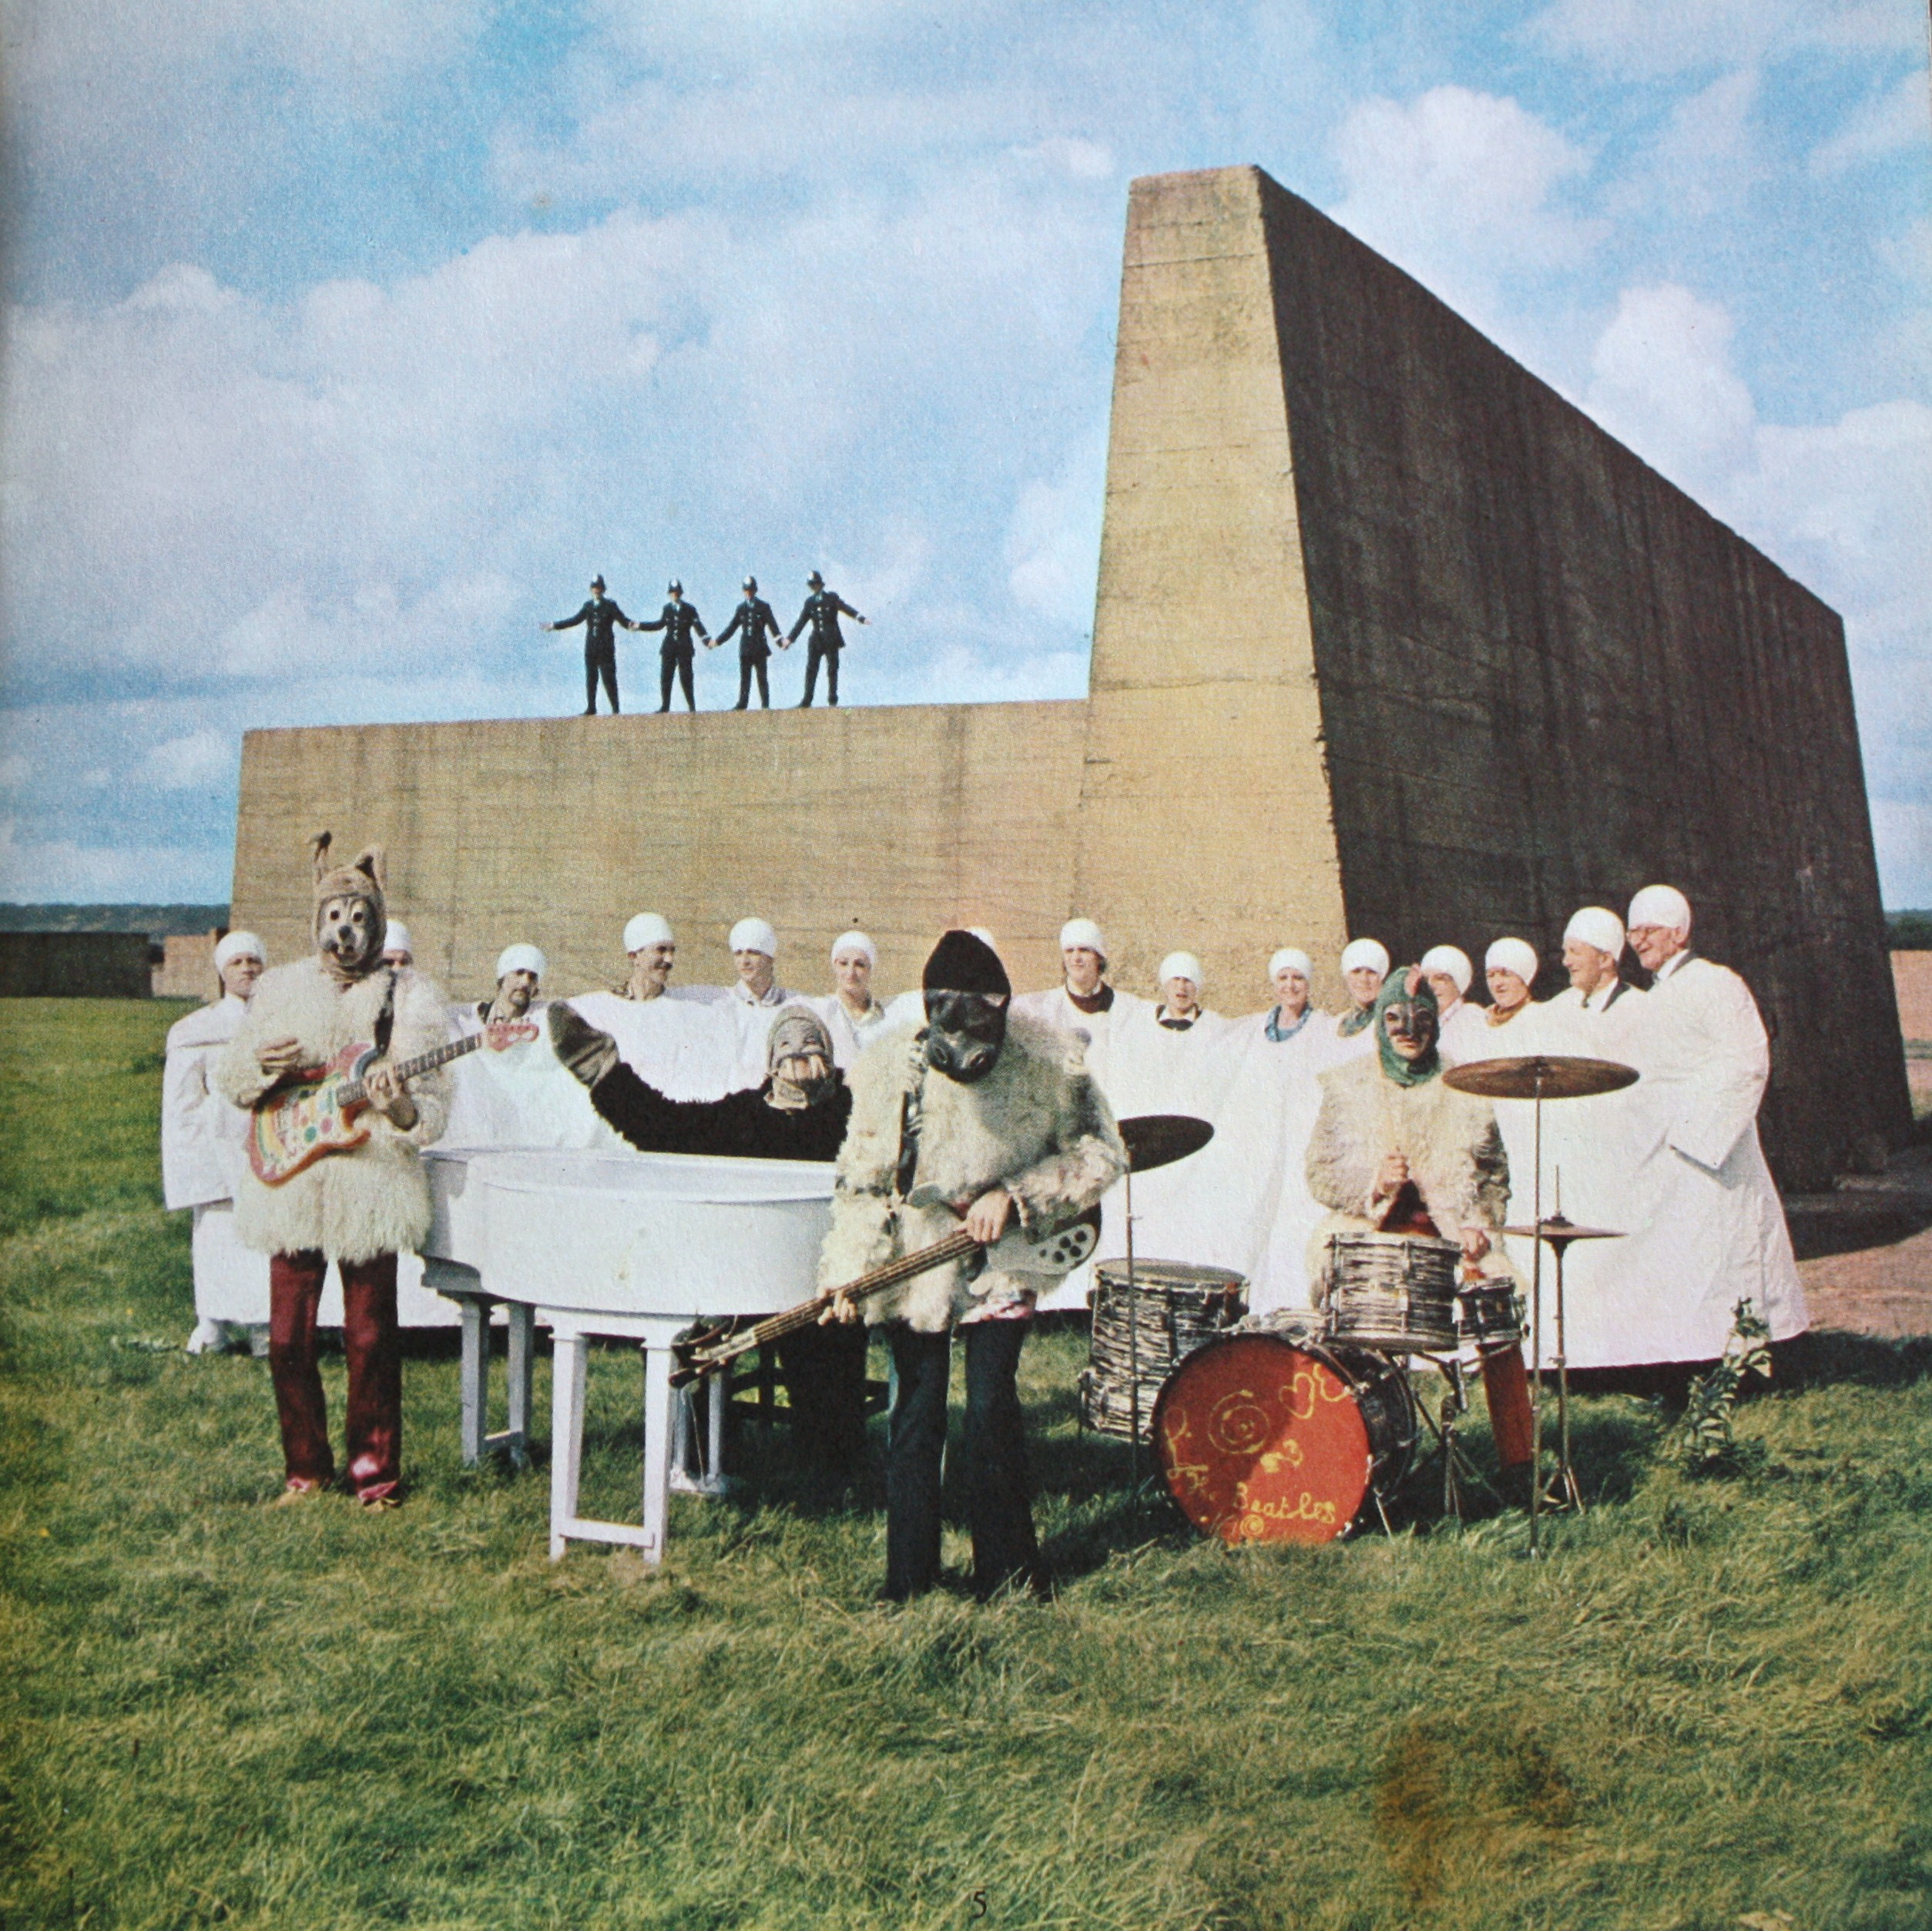 beatles-magical-mystery-tour-ep-i-am-the-walrus-7825.jpg